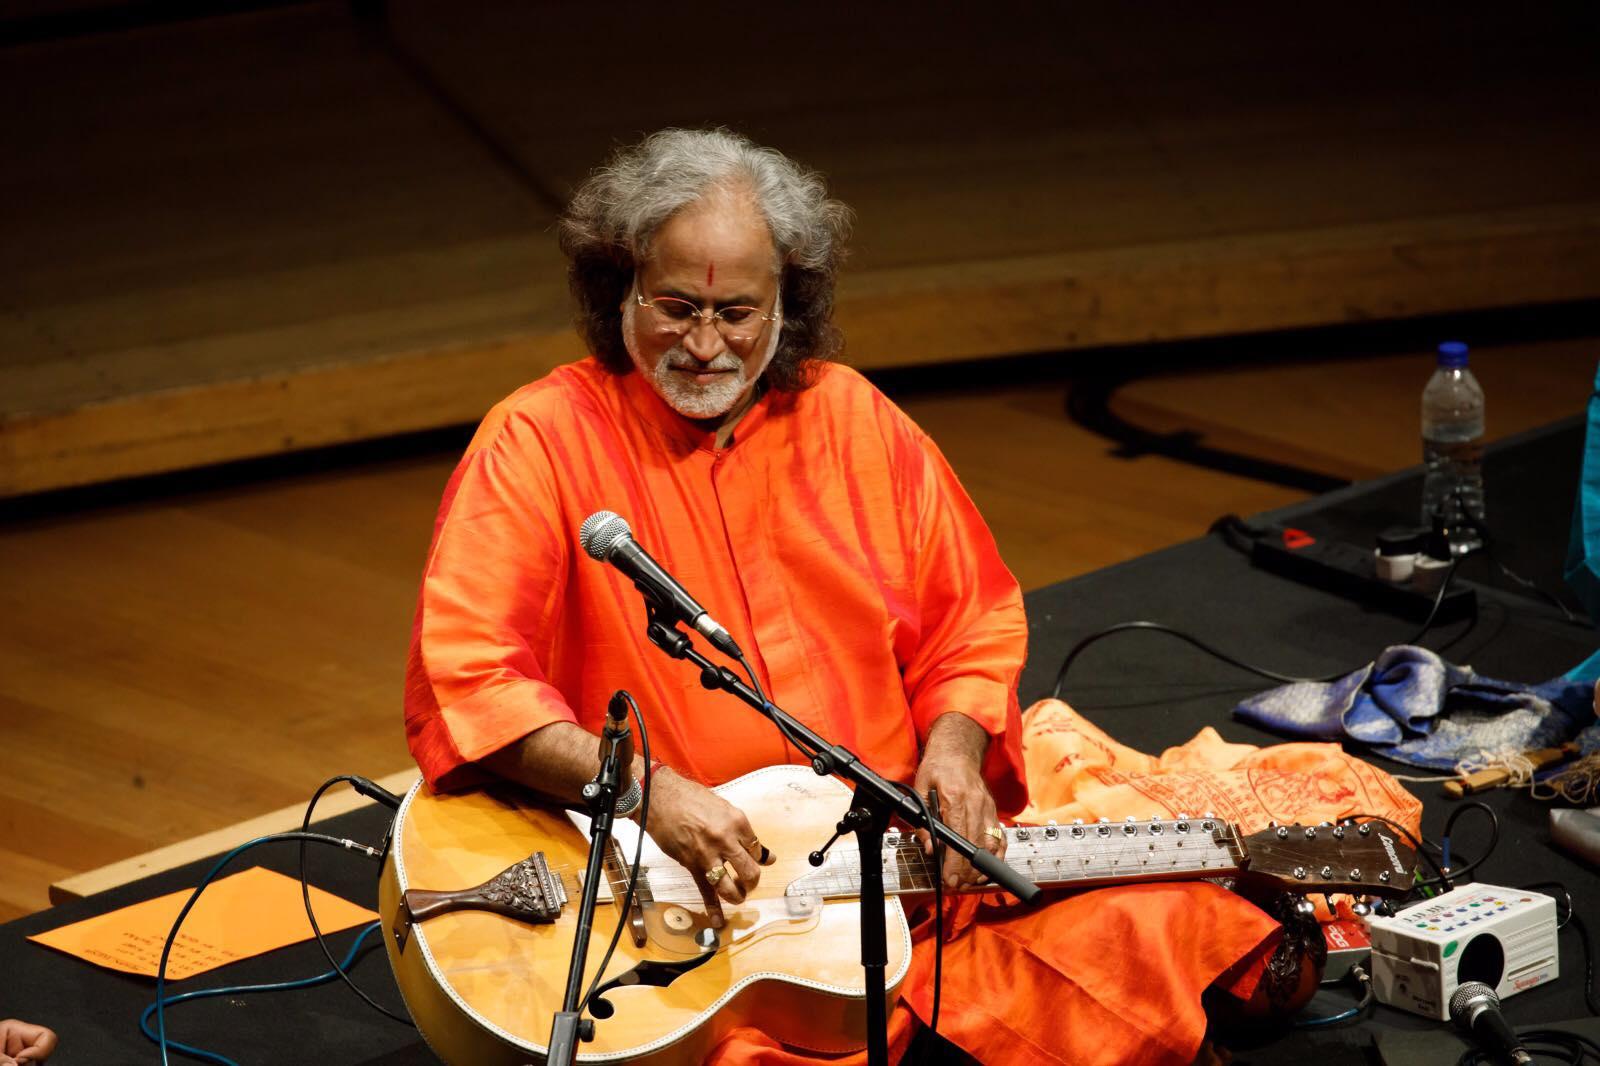 Pandit Vishwa Mohan Bhatt performing during in Kalaa Utsavam on 18th November. Photo courtesy: Esplanade - Theatres by the Bay.